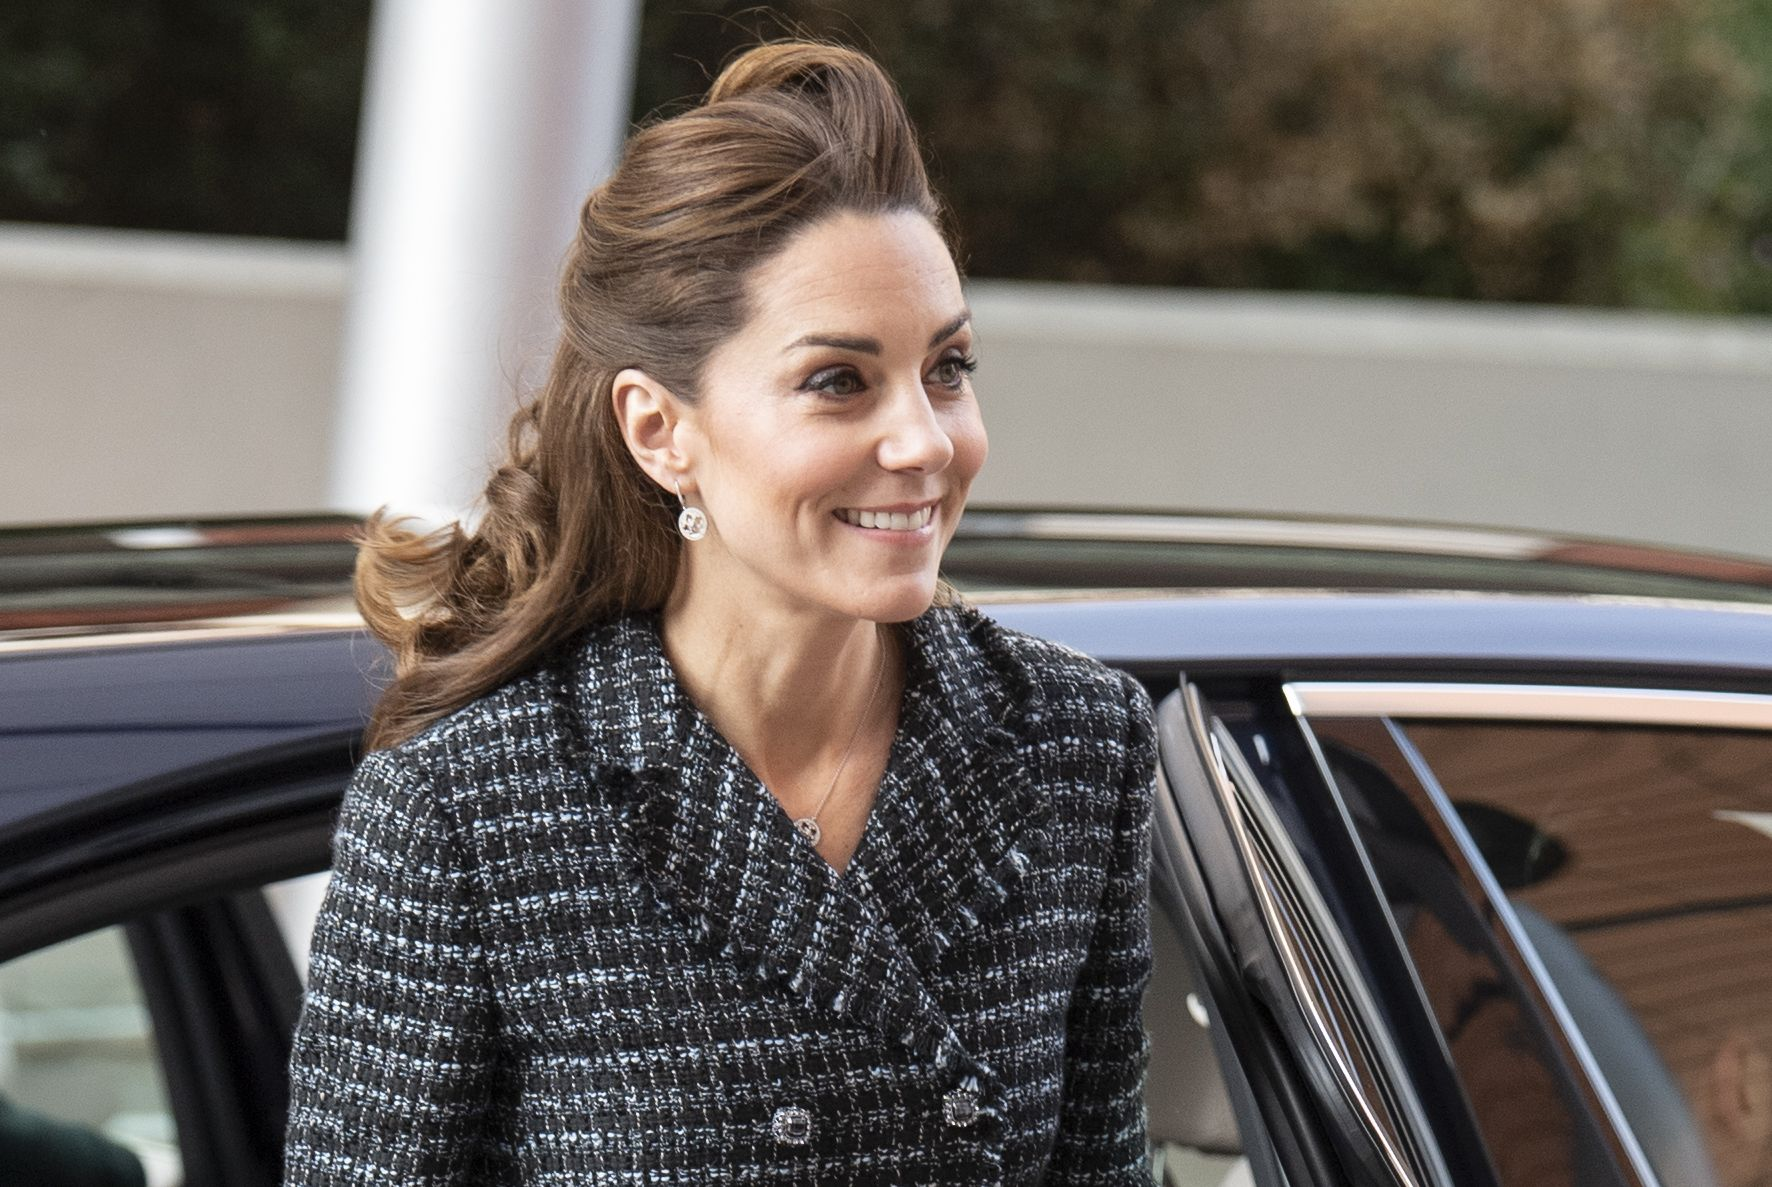 Kate Middleton Rewore Her Favorite Tweed Skirt Suit to Evelina London Children's Hospital